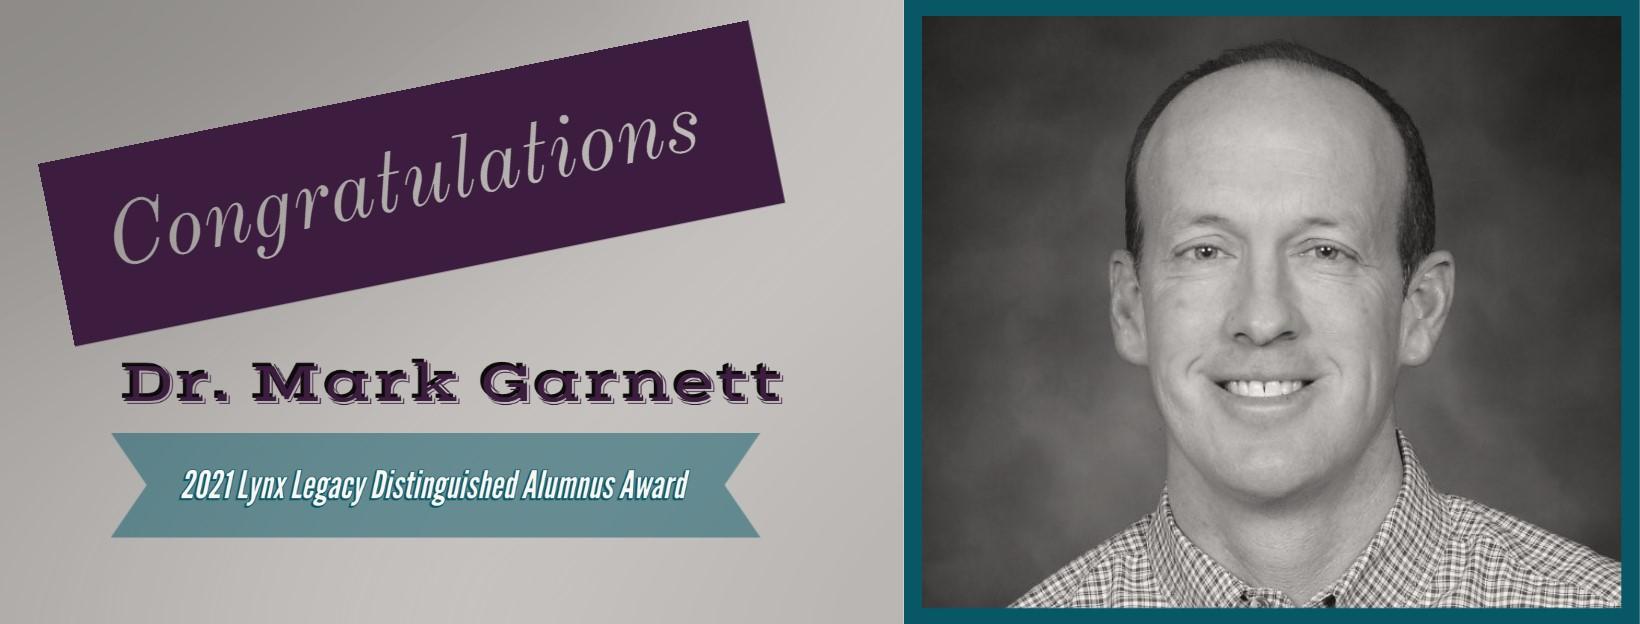 2021 Alumni Award Garnett